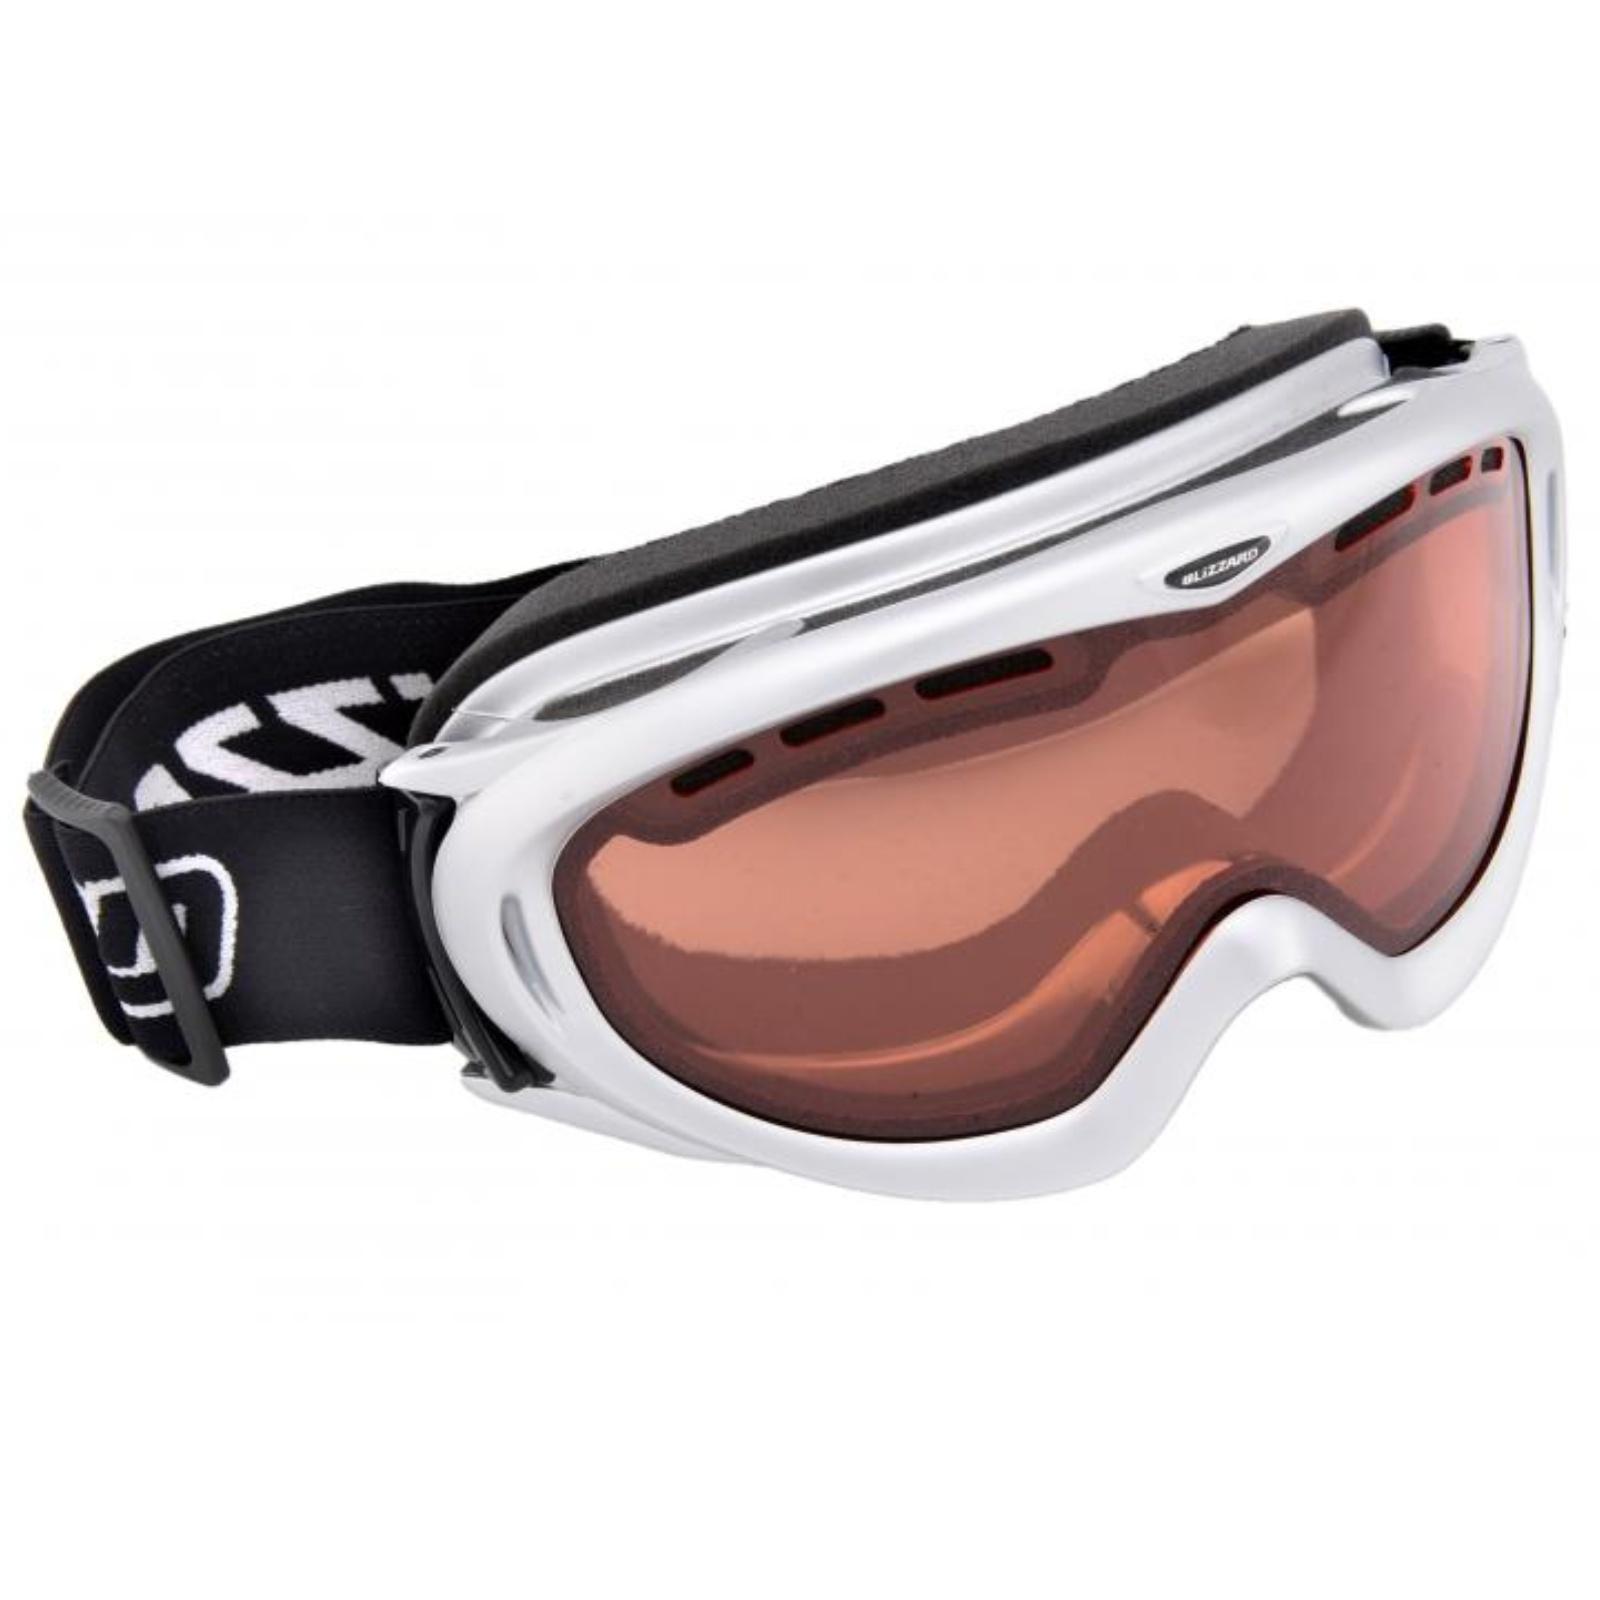 Lyžařské brýle BLIZZARD 905 DAVO - stříbrné